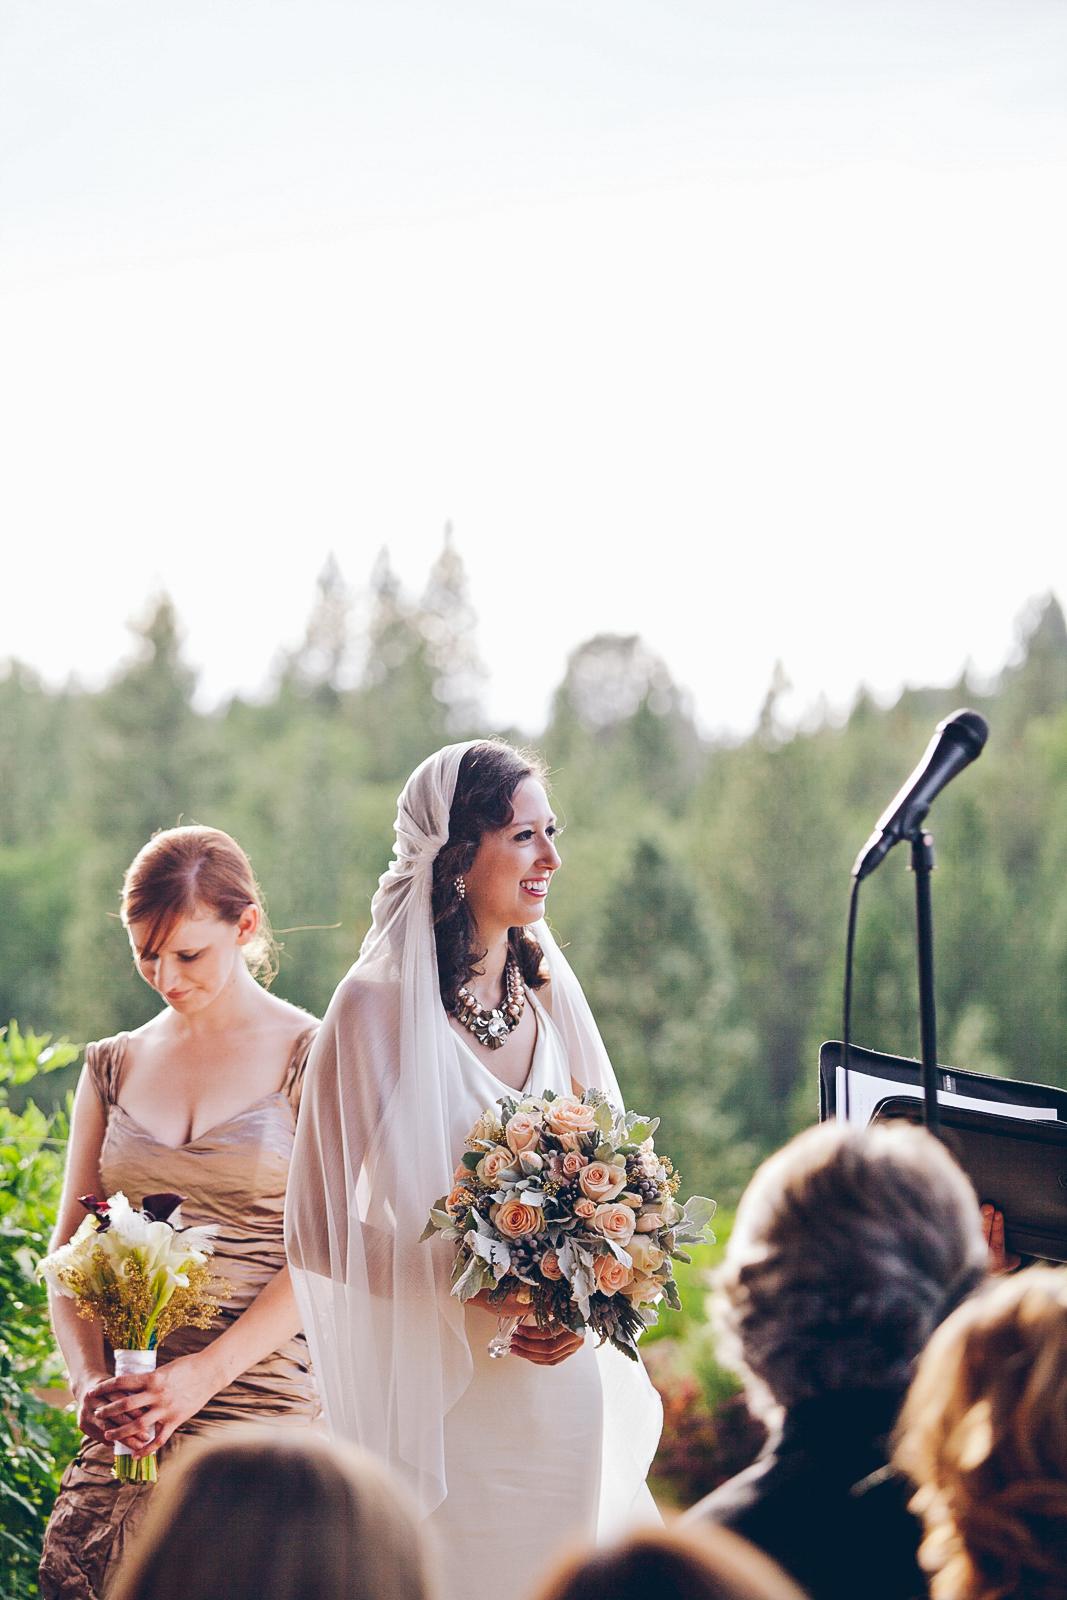 miraflores_winery_wedding_photography_ian_melissa_ebony_siovhan_bokeh_photography_29.jpg